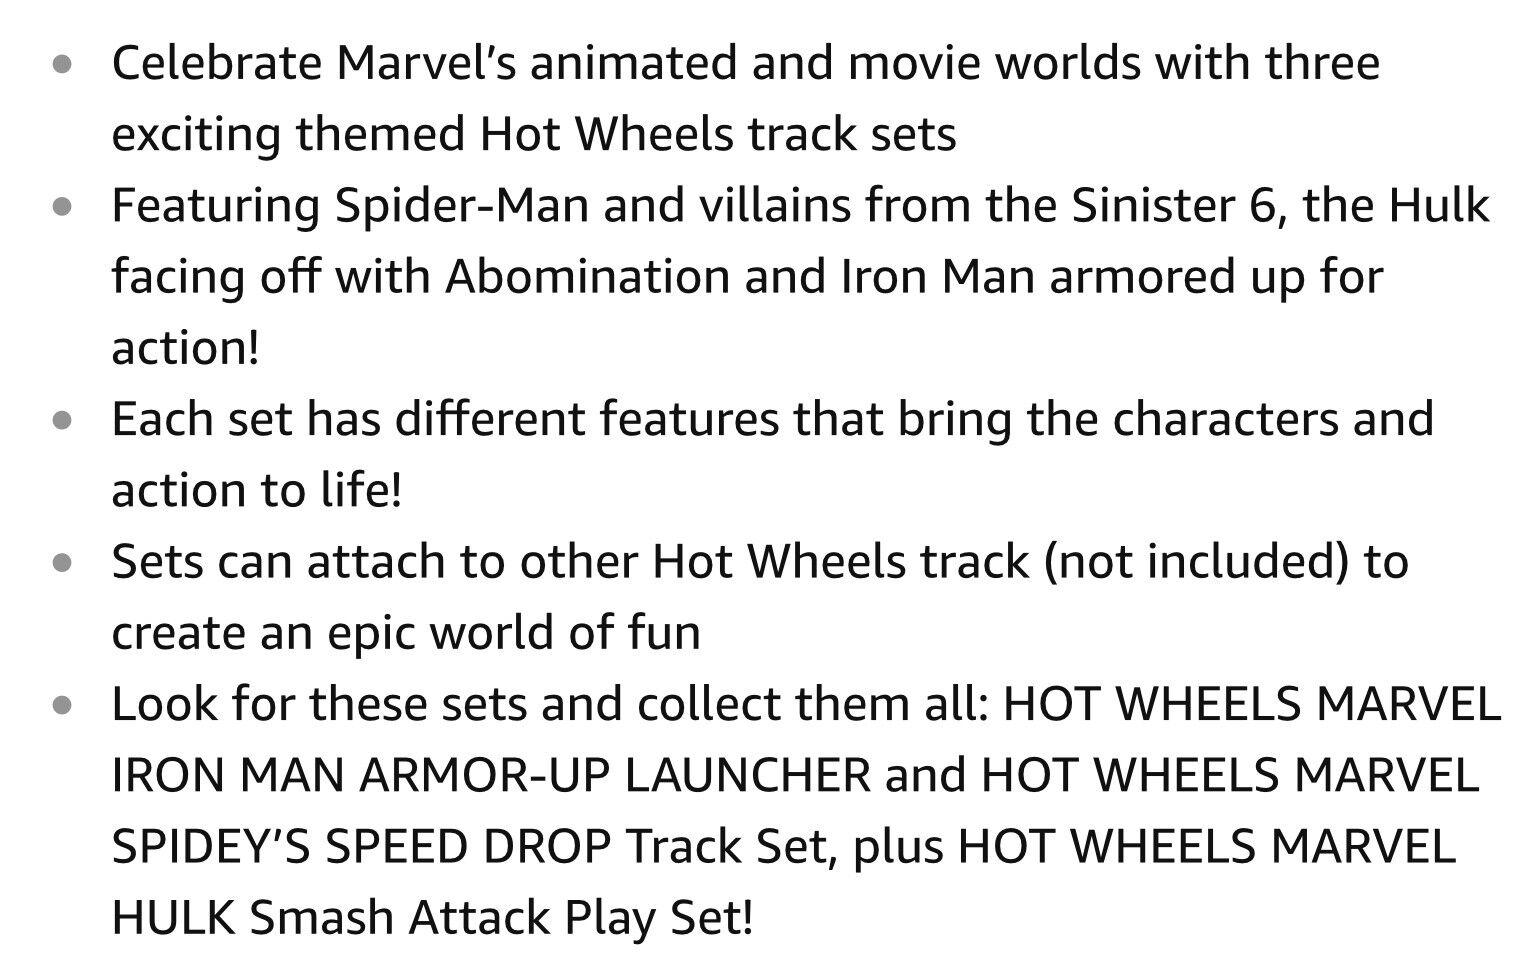 NEW Hot Wheels Marvel Avengers Iron Iron Iron Man Armor-Up Launcher Tony Stark Vehicle b56d8c